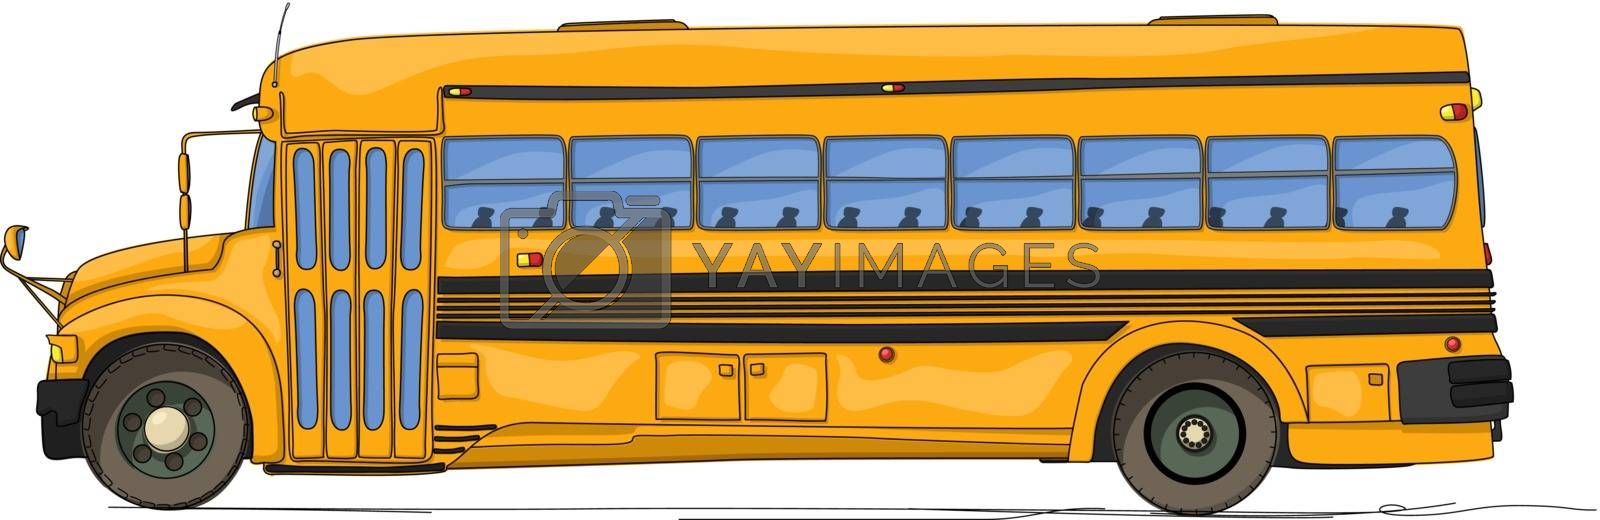 School bus cartoon against white background